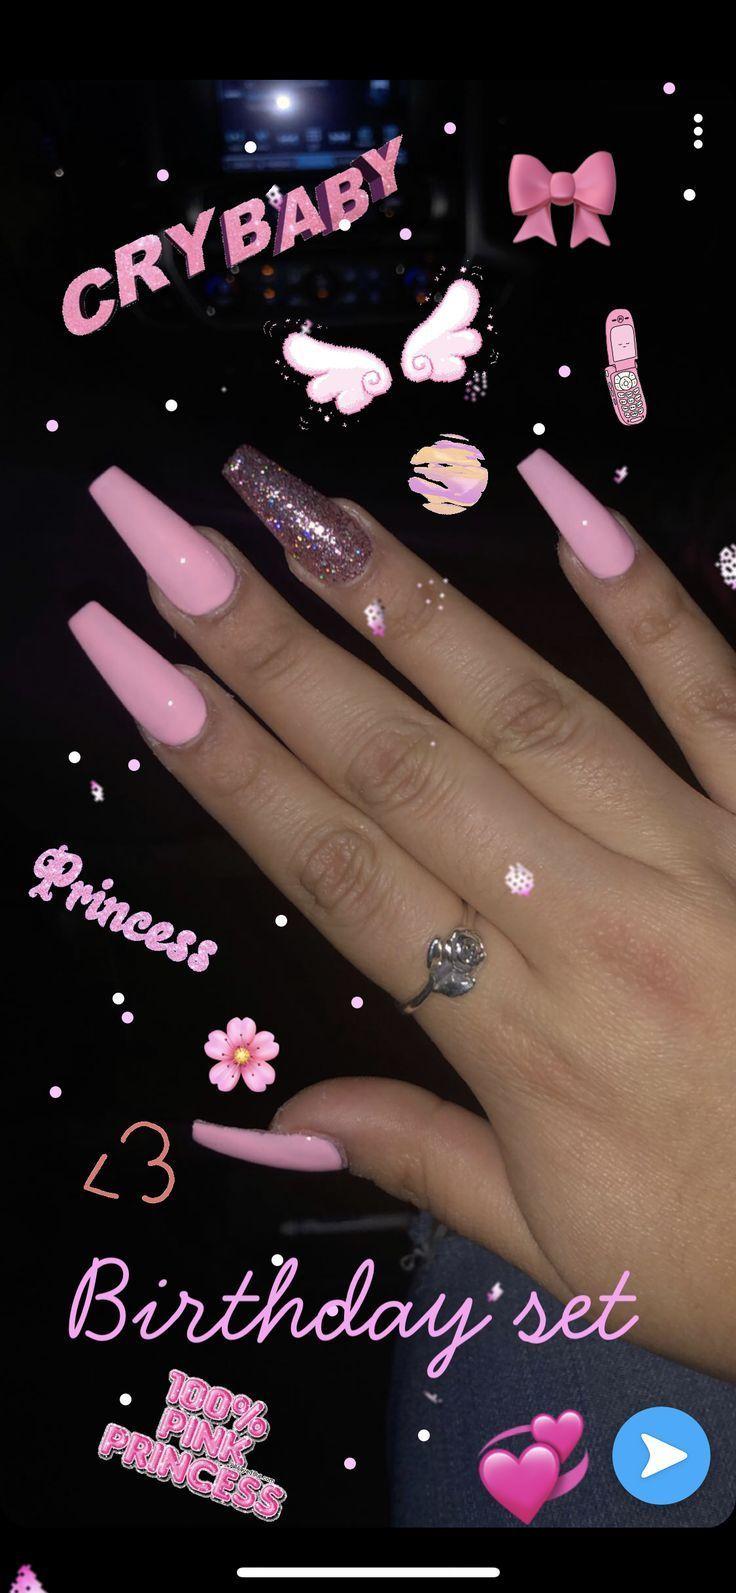 My 18th Birthday Set Pink Acrylic Nails Glitter Coffin Baddie Acrylic Nails Coffin Pink Long Acrylic Nails Ombre Acrylic Nails